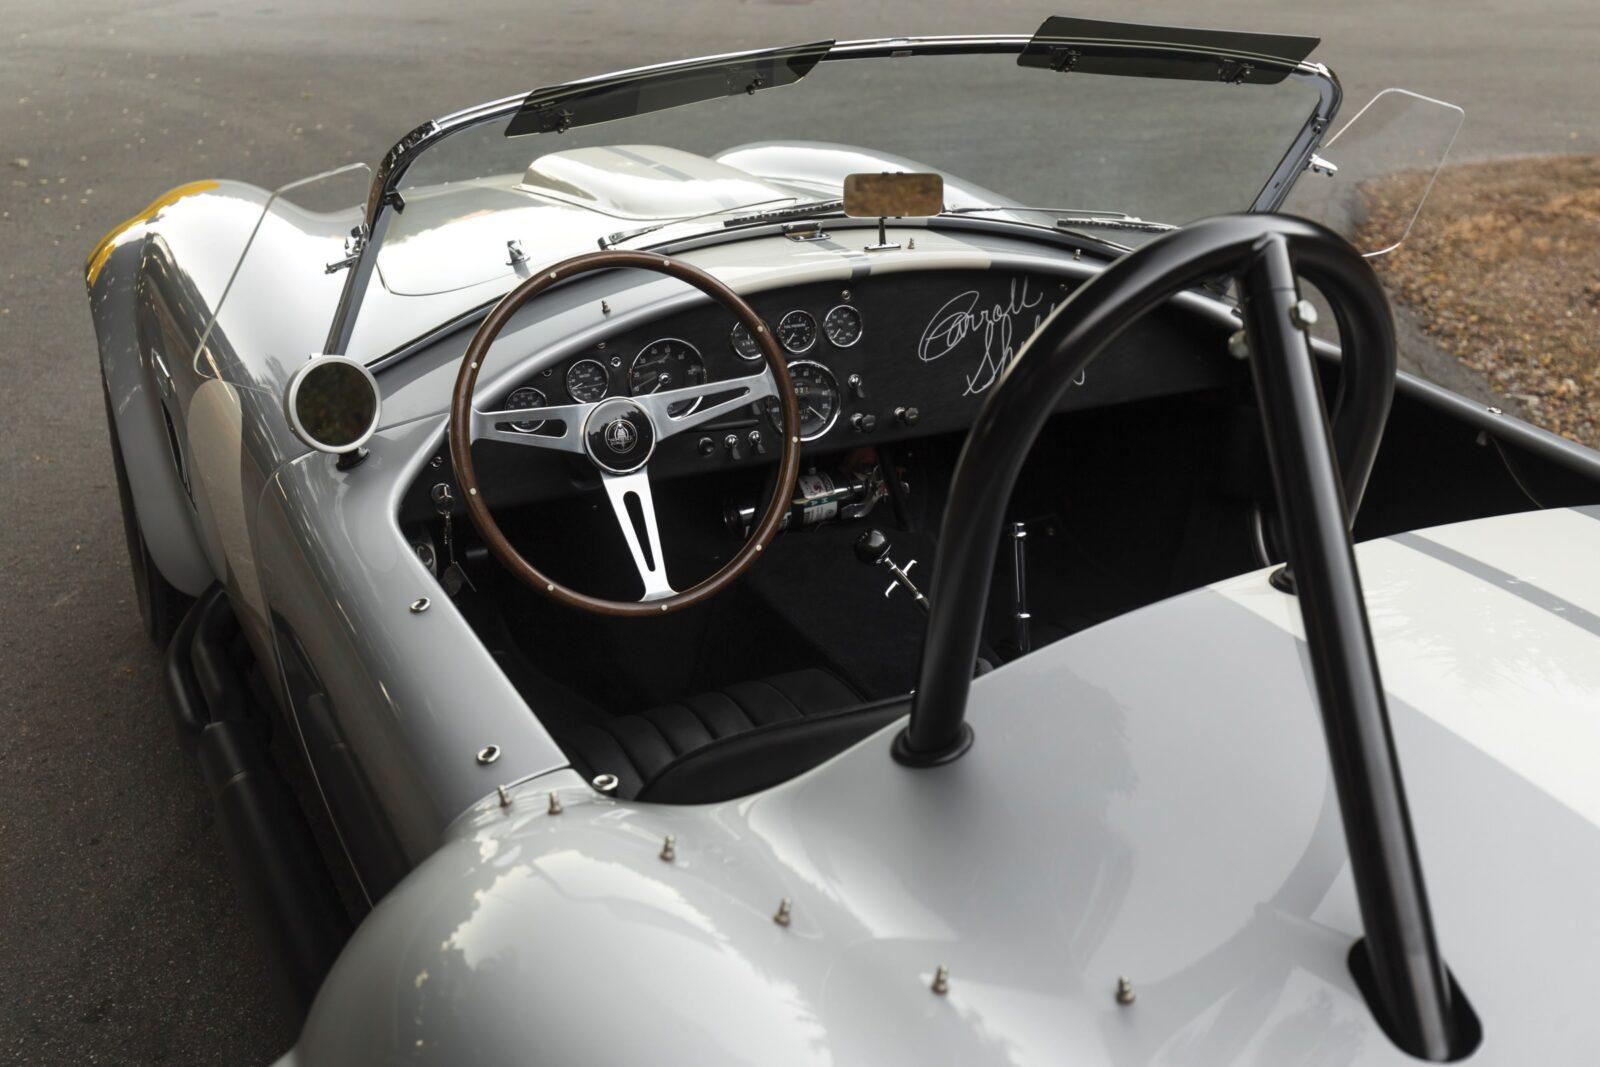 1966 Shelby Cobra 427 'Semi-Competition'